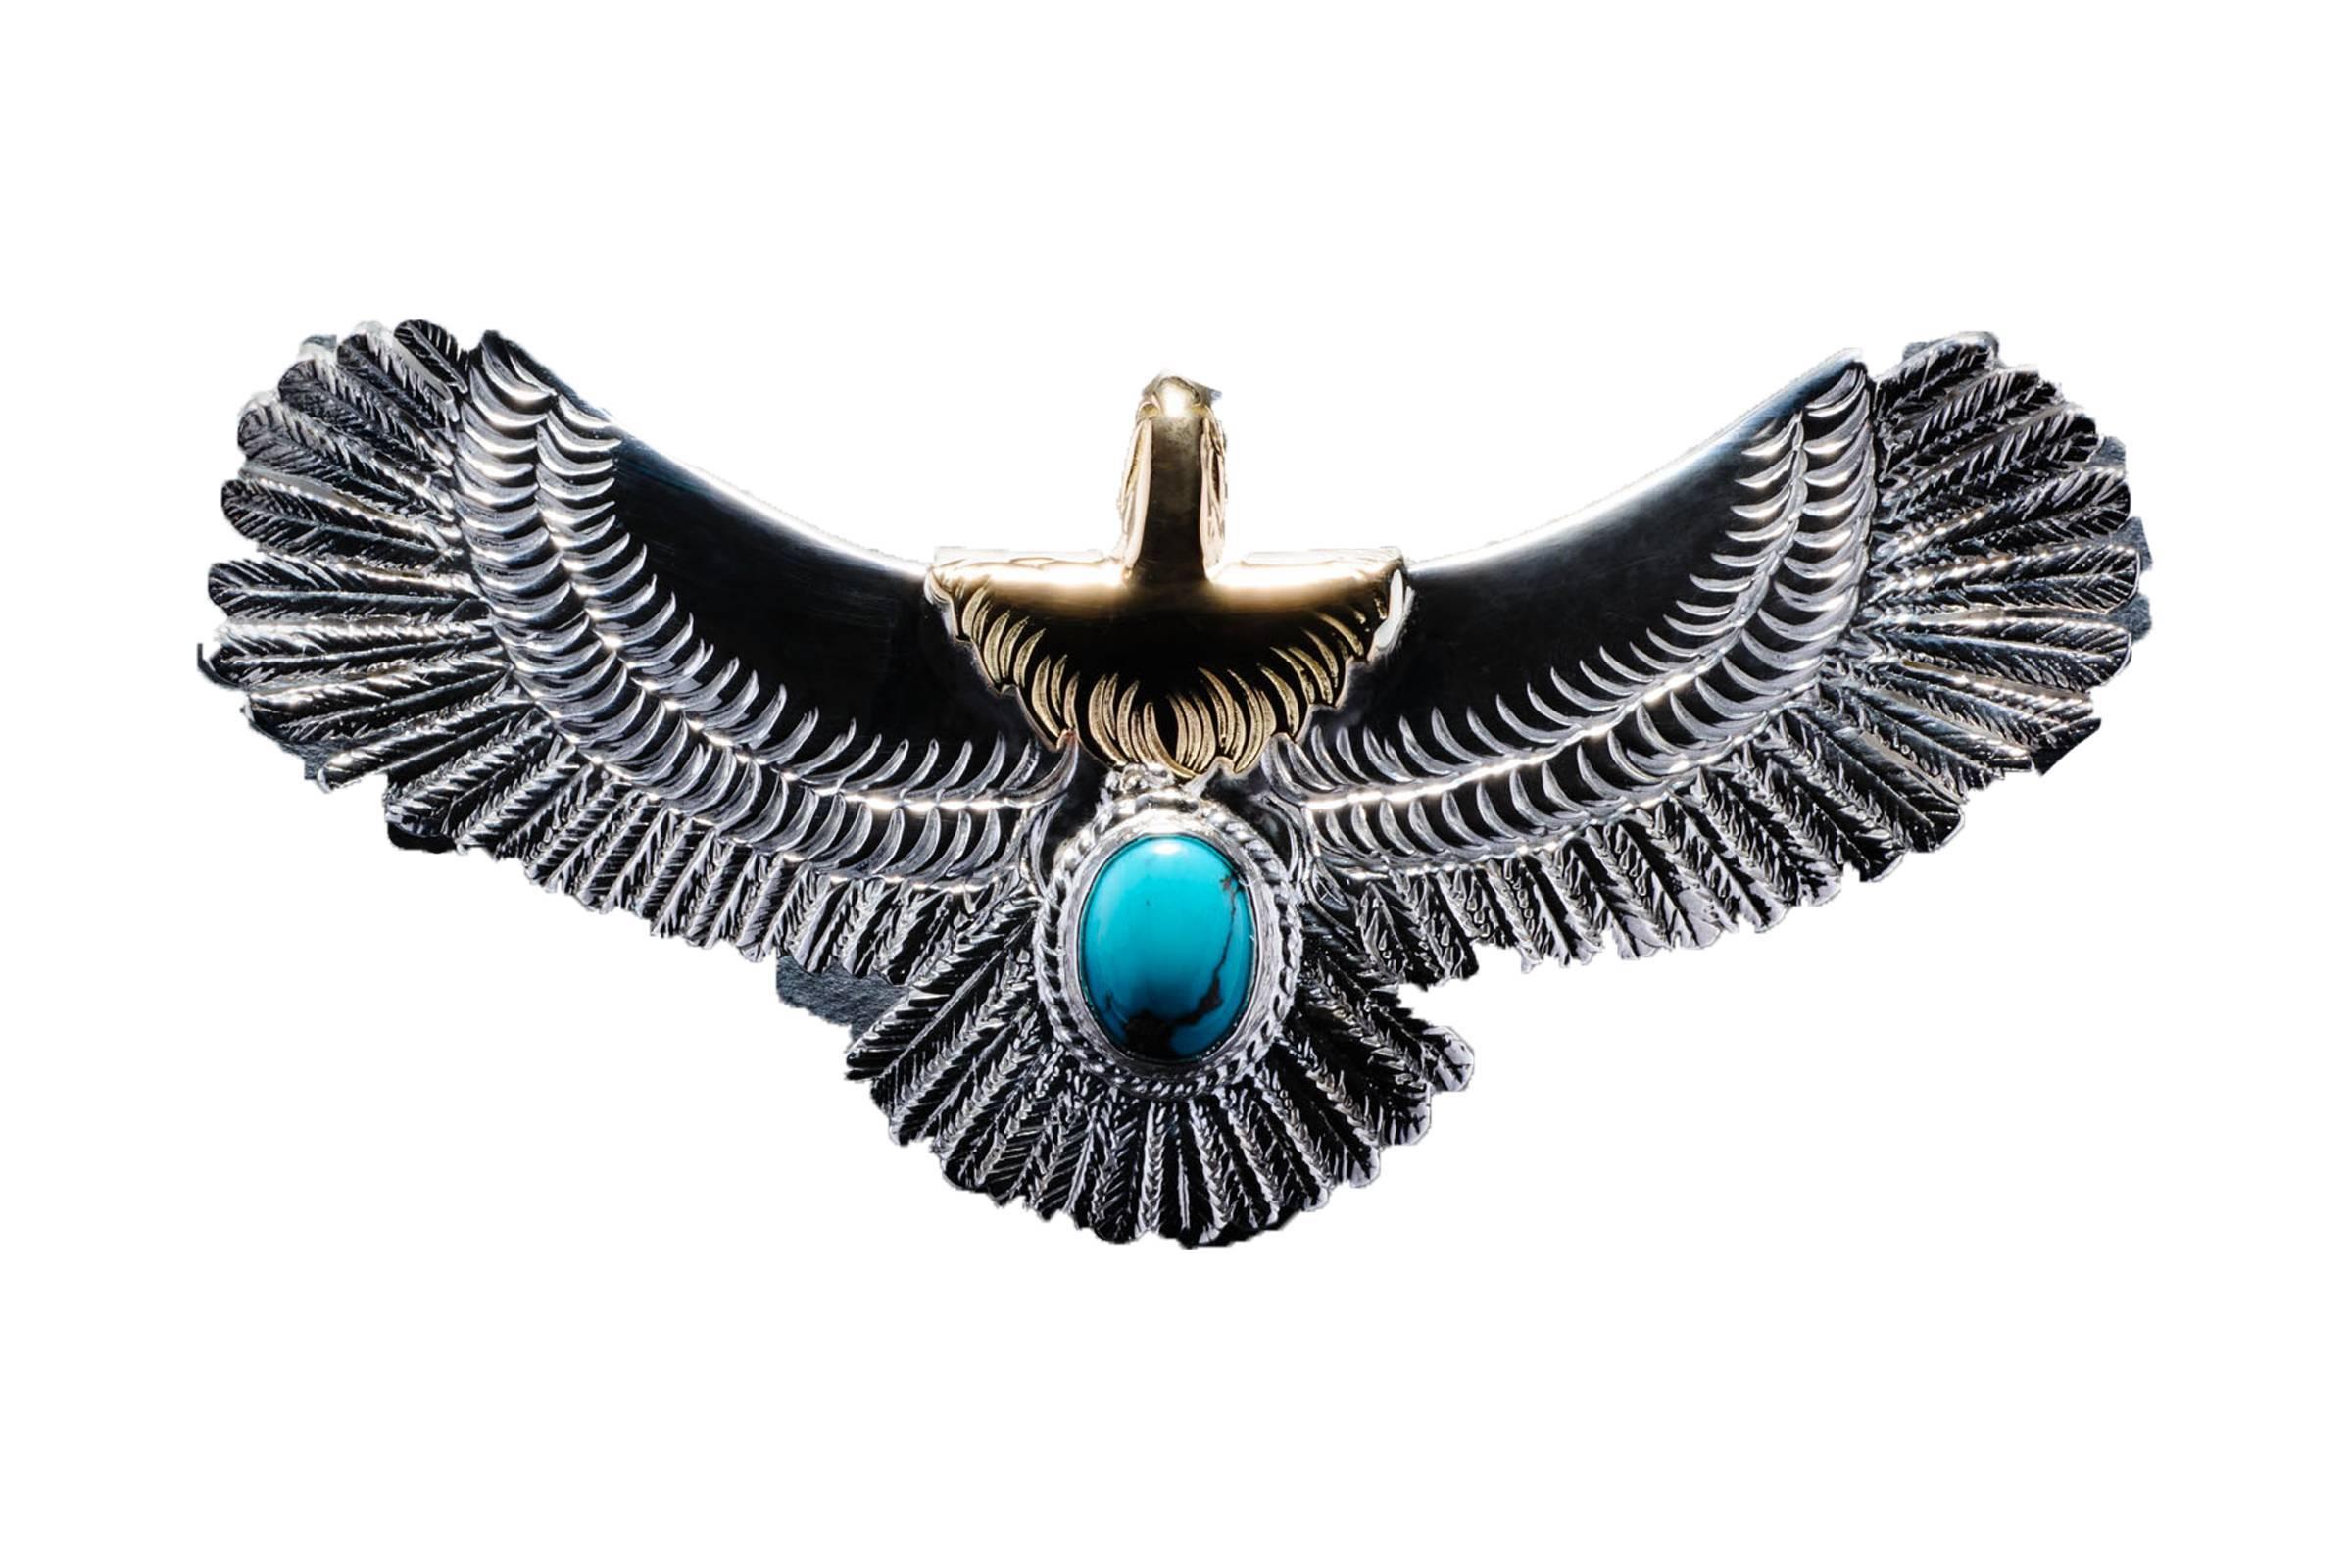 Goros Natural Turquoise Vintage Eagle Pendant & Chain